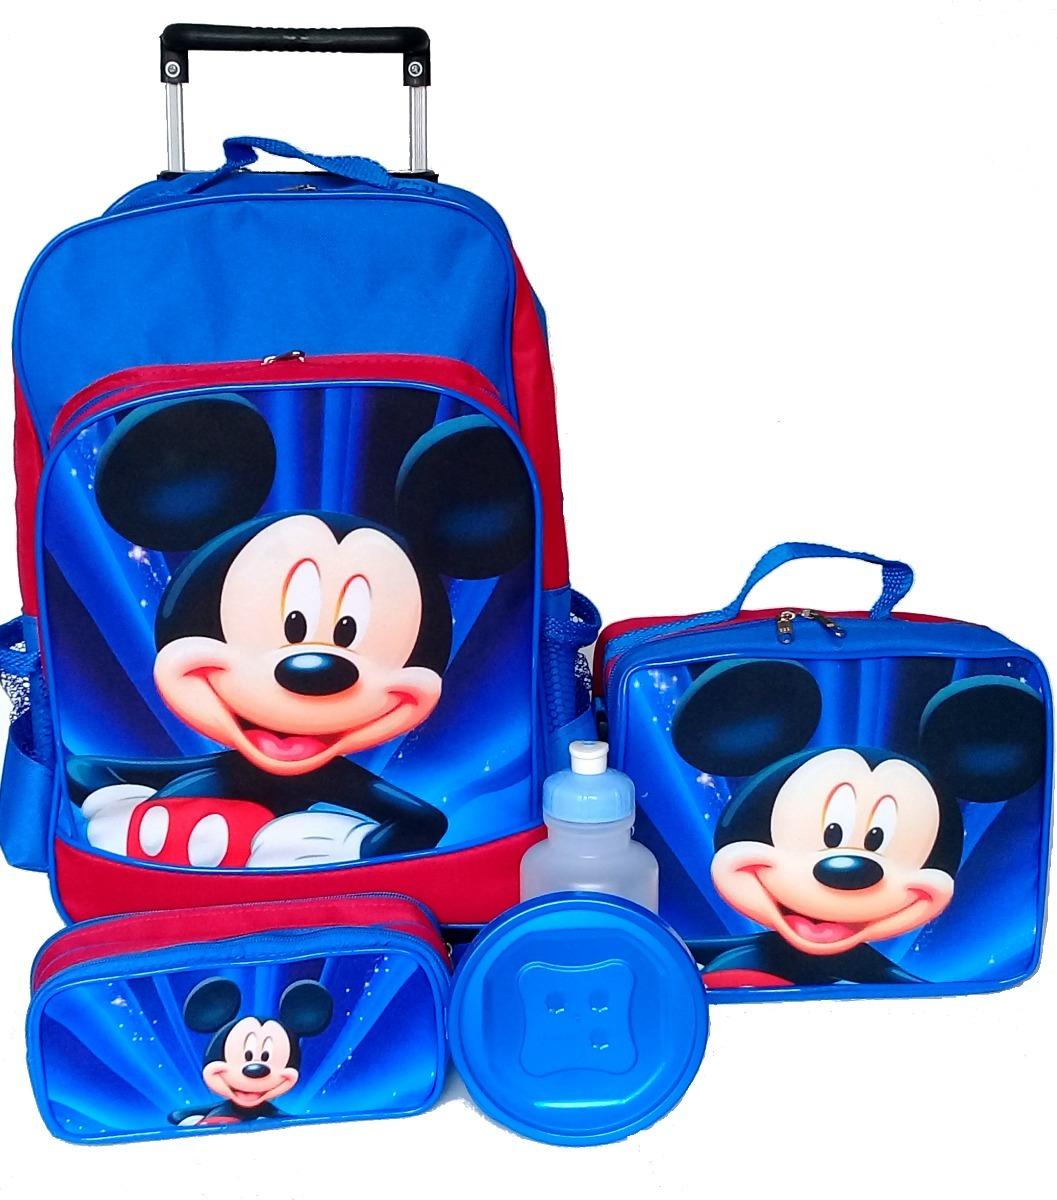 06057312b11d23 kit mochila mickey mouse rodinhas + lancheira + estojo g. Carregando zoom.